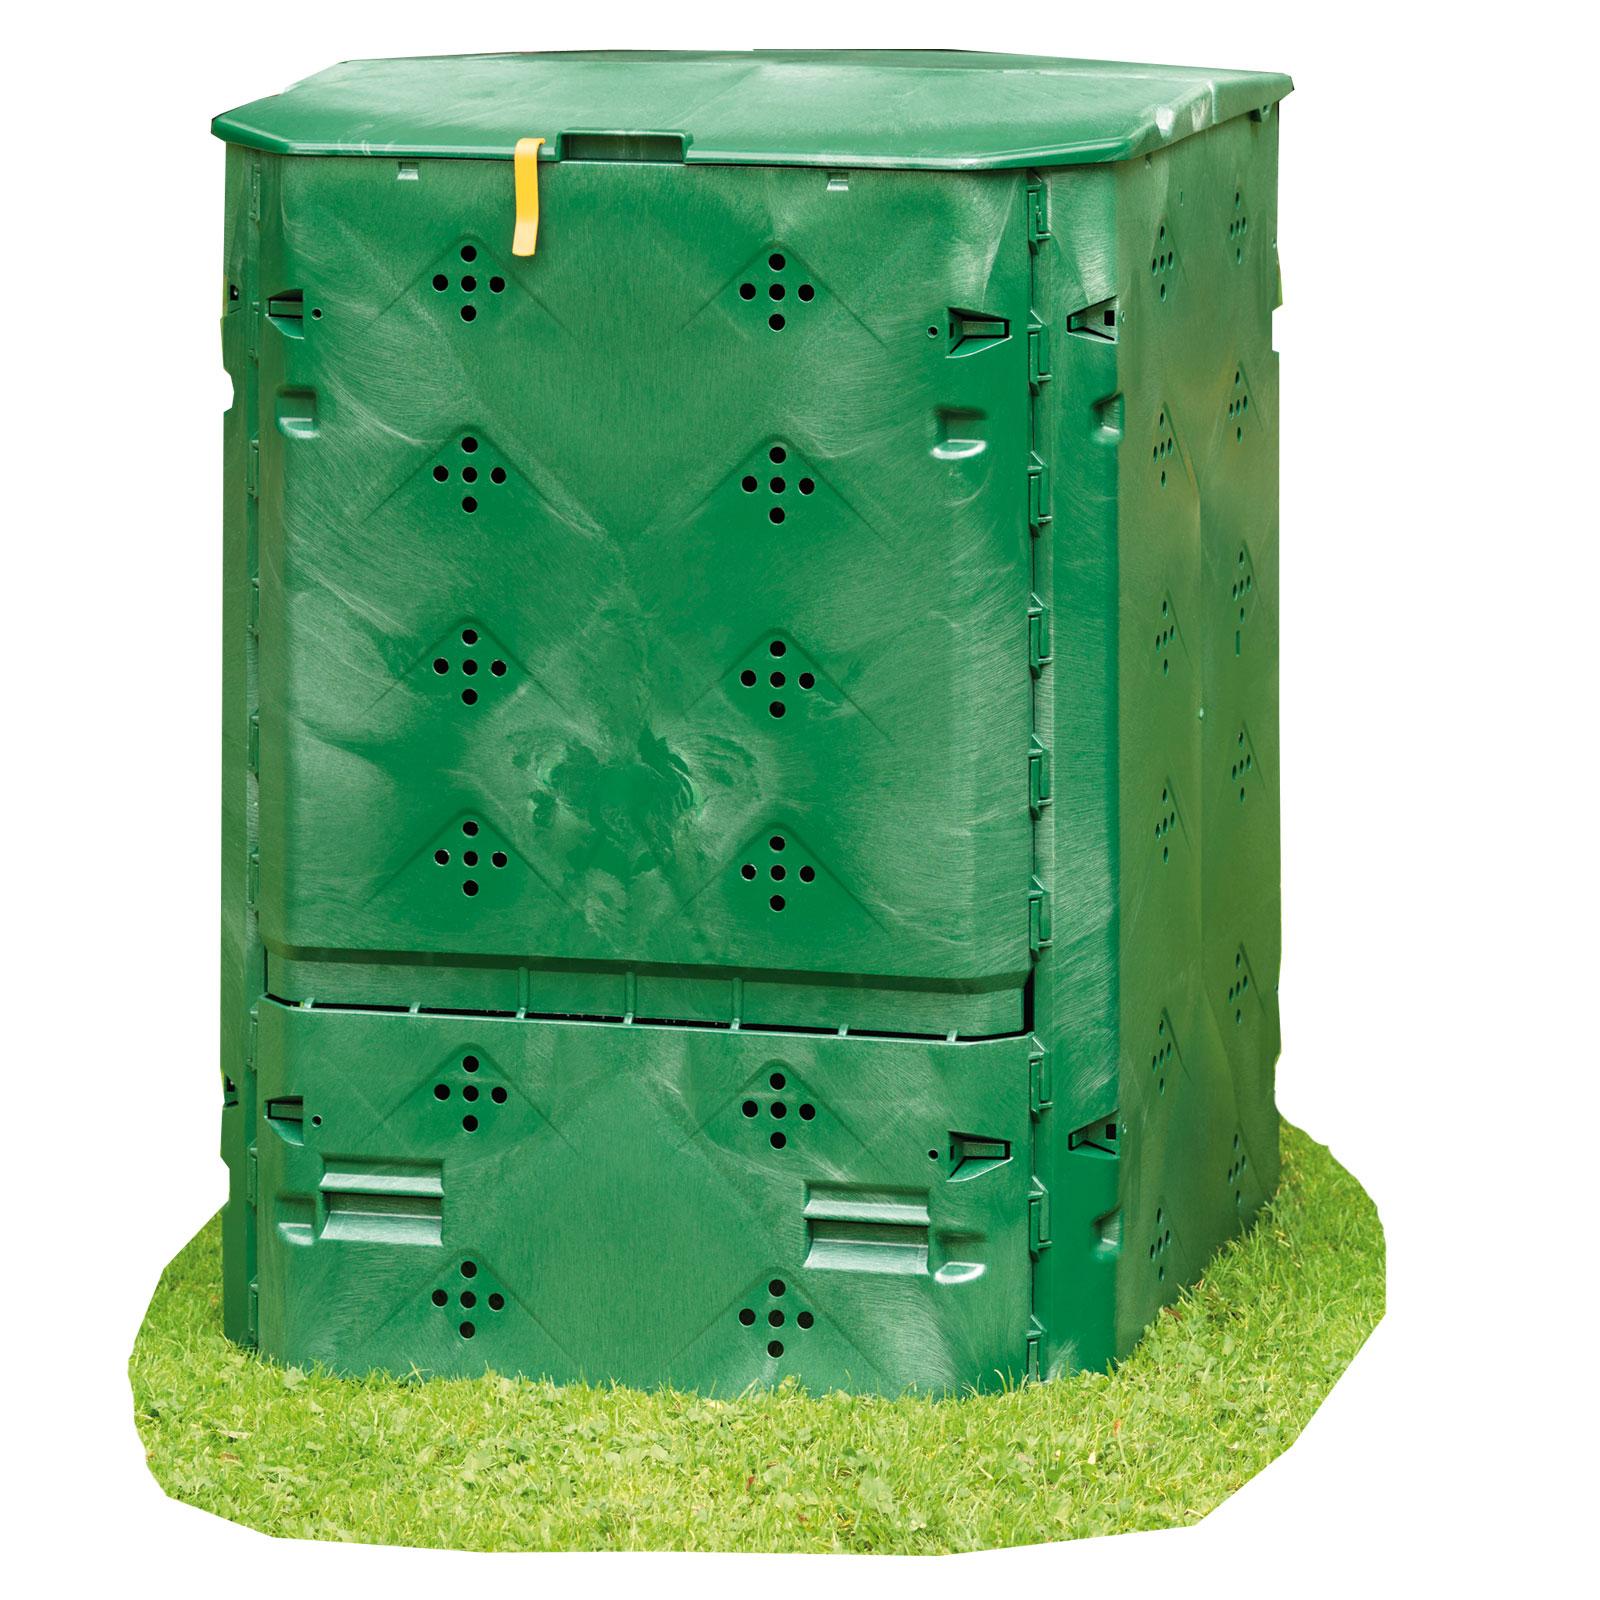 Juwel Komposter Thermokomposter BIO 600 Kompostbehälter Kompost Kunststoff 20153